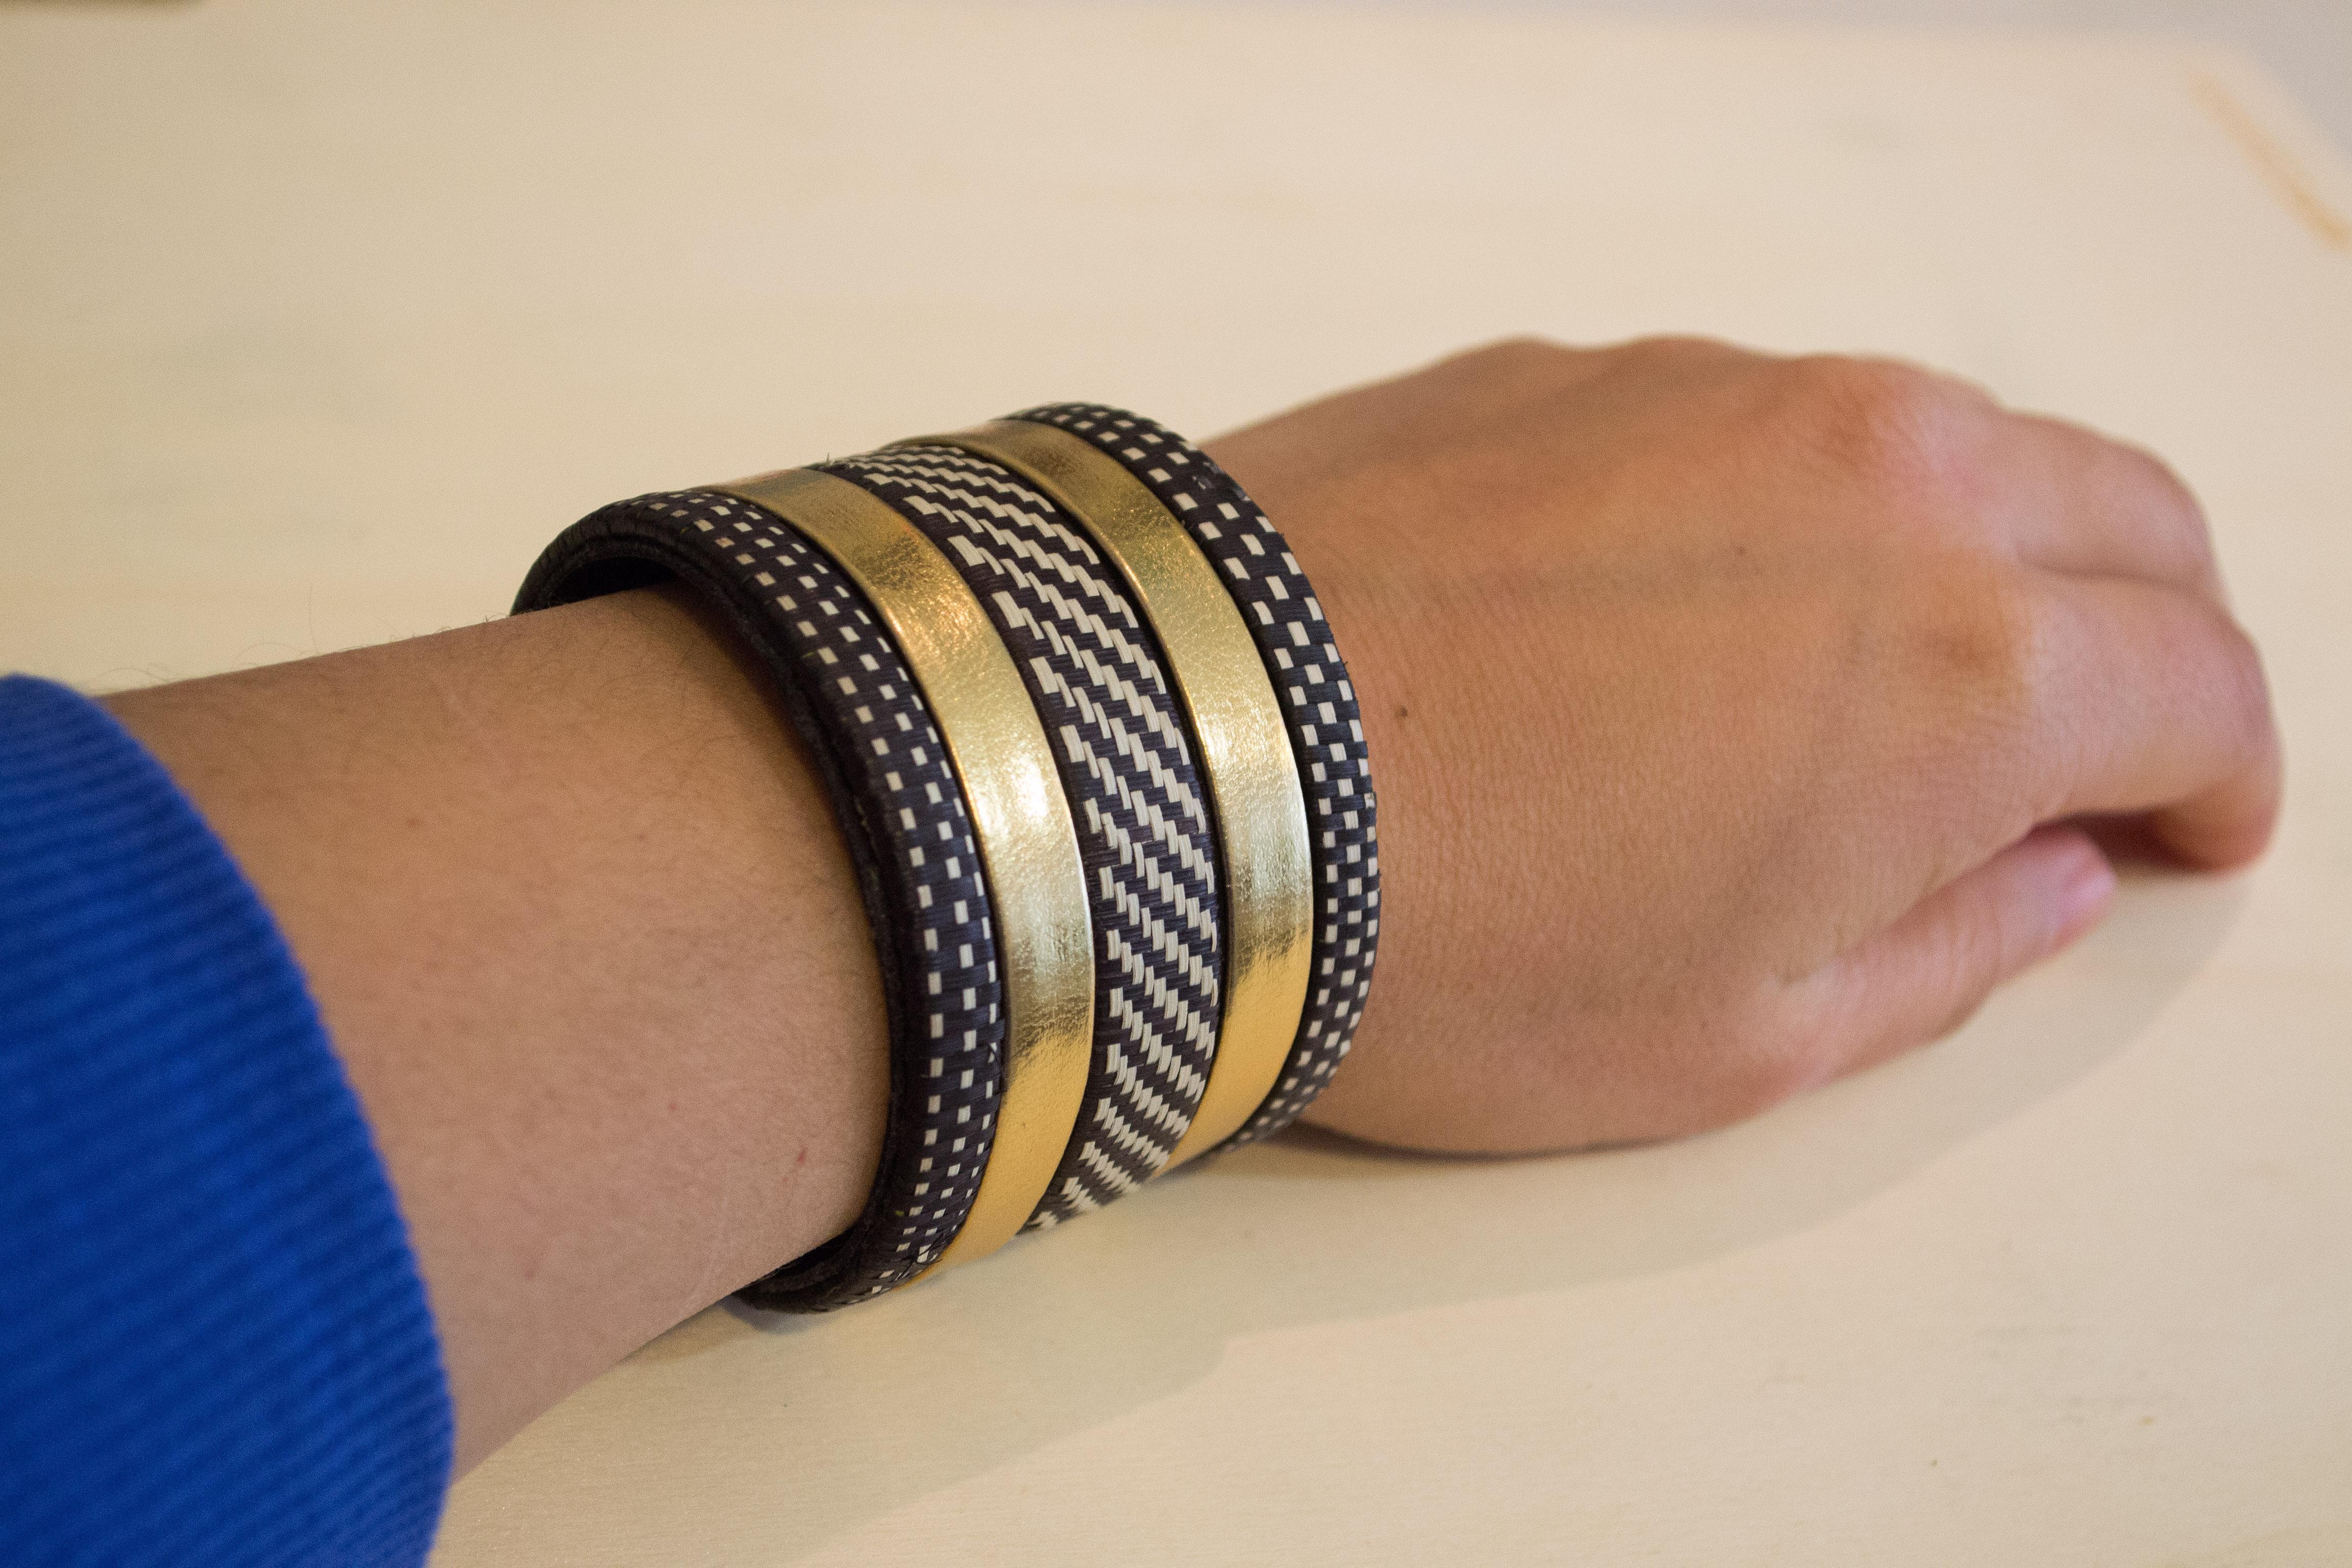 Caña Flecha Armband In Gold oder Silber